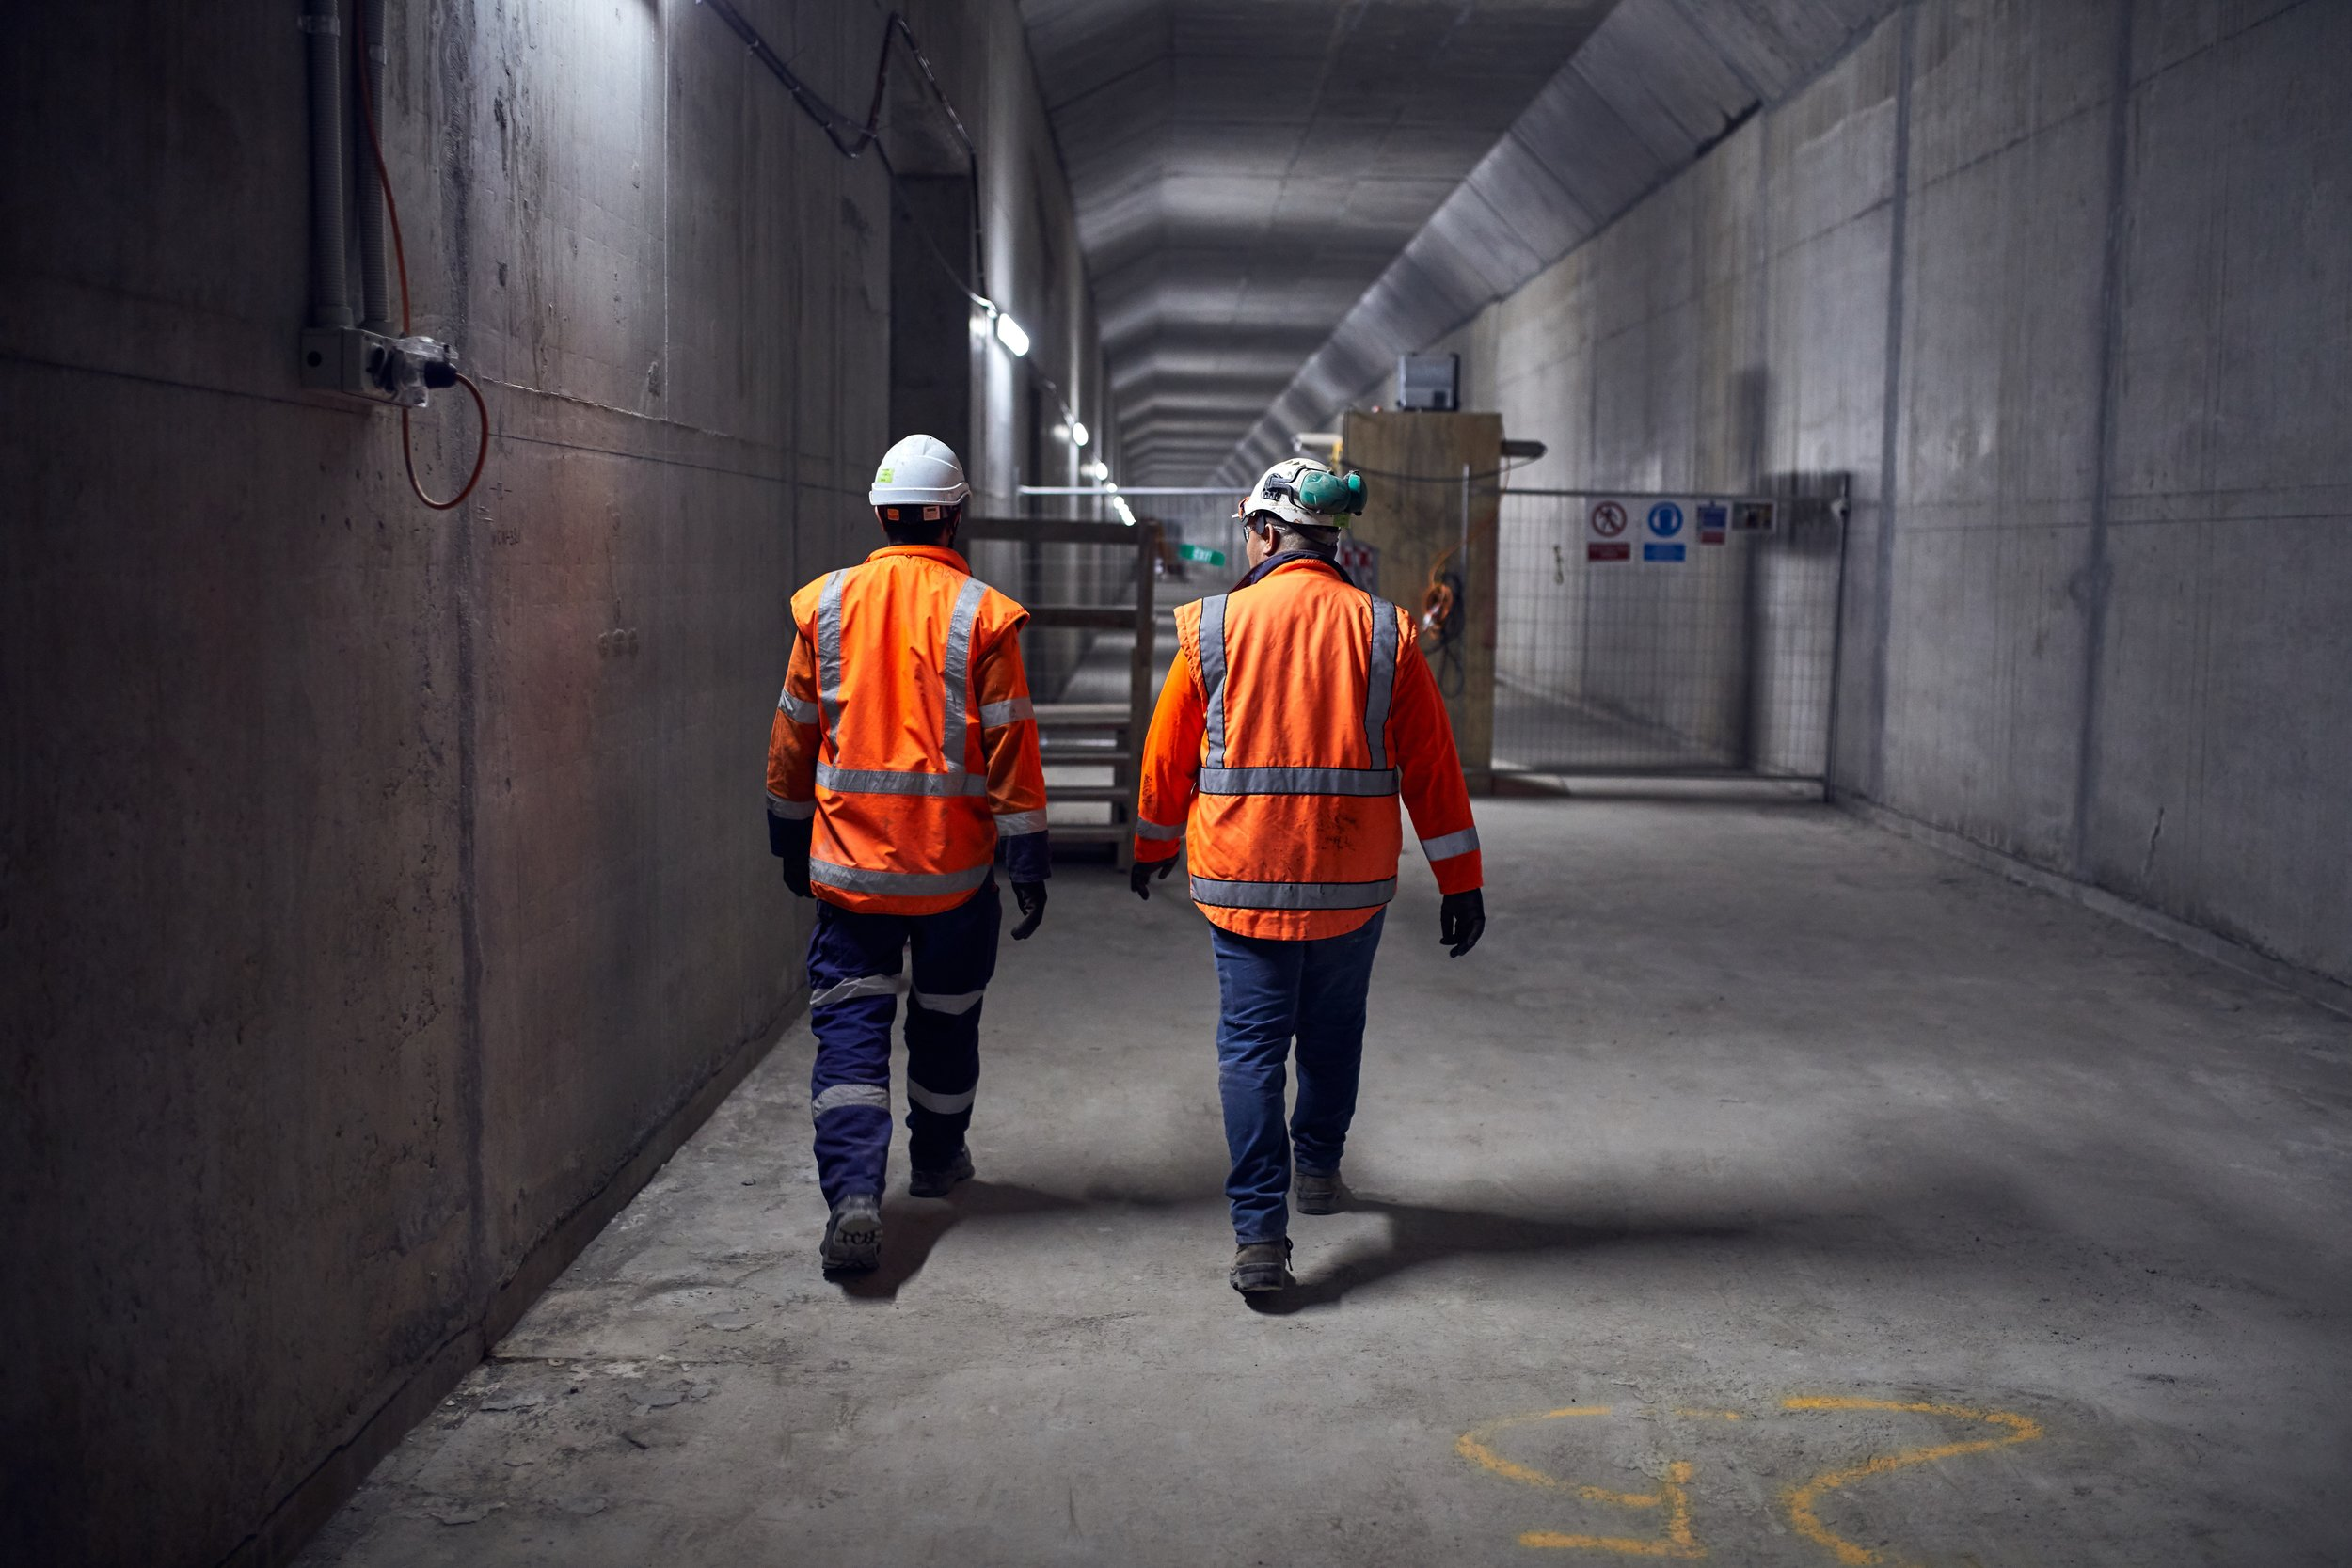 Tunnel June 19 2019